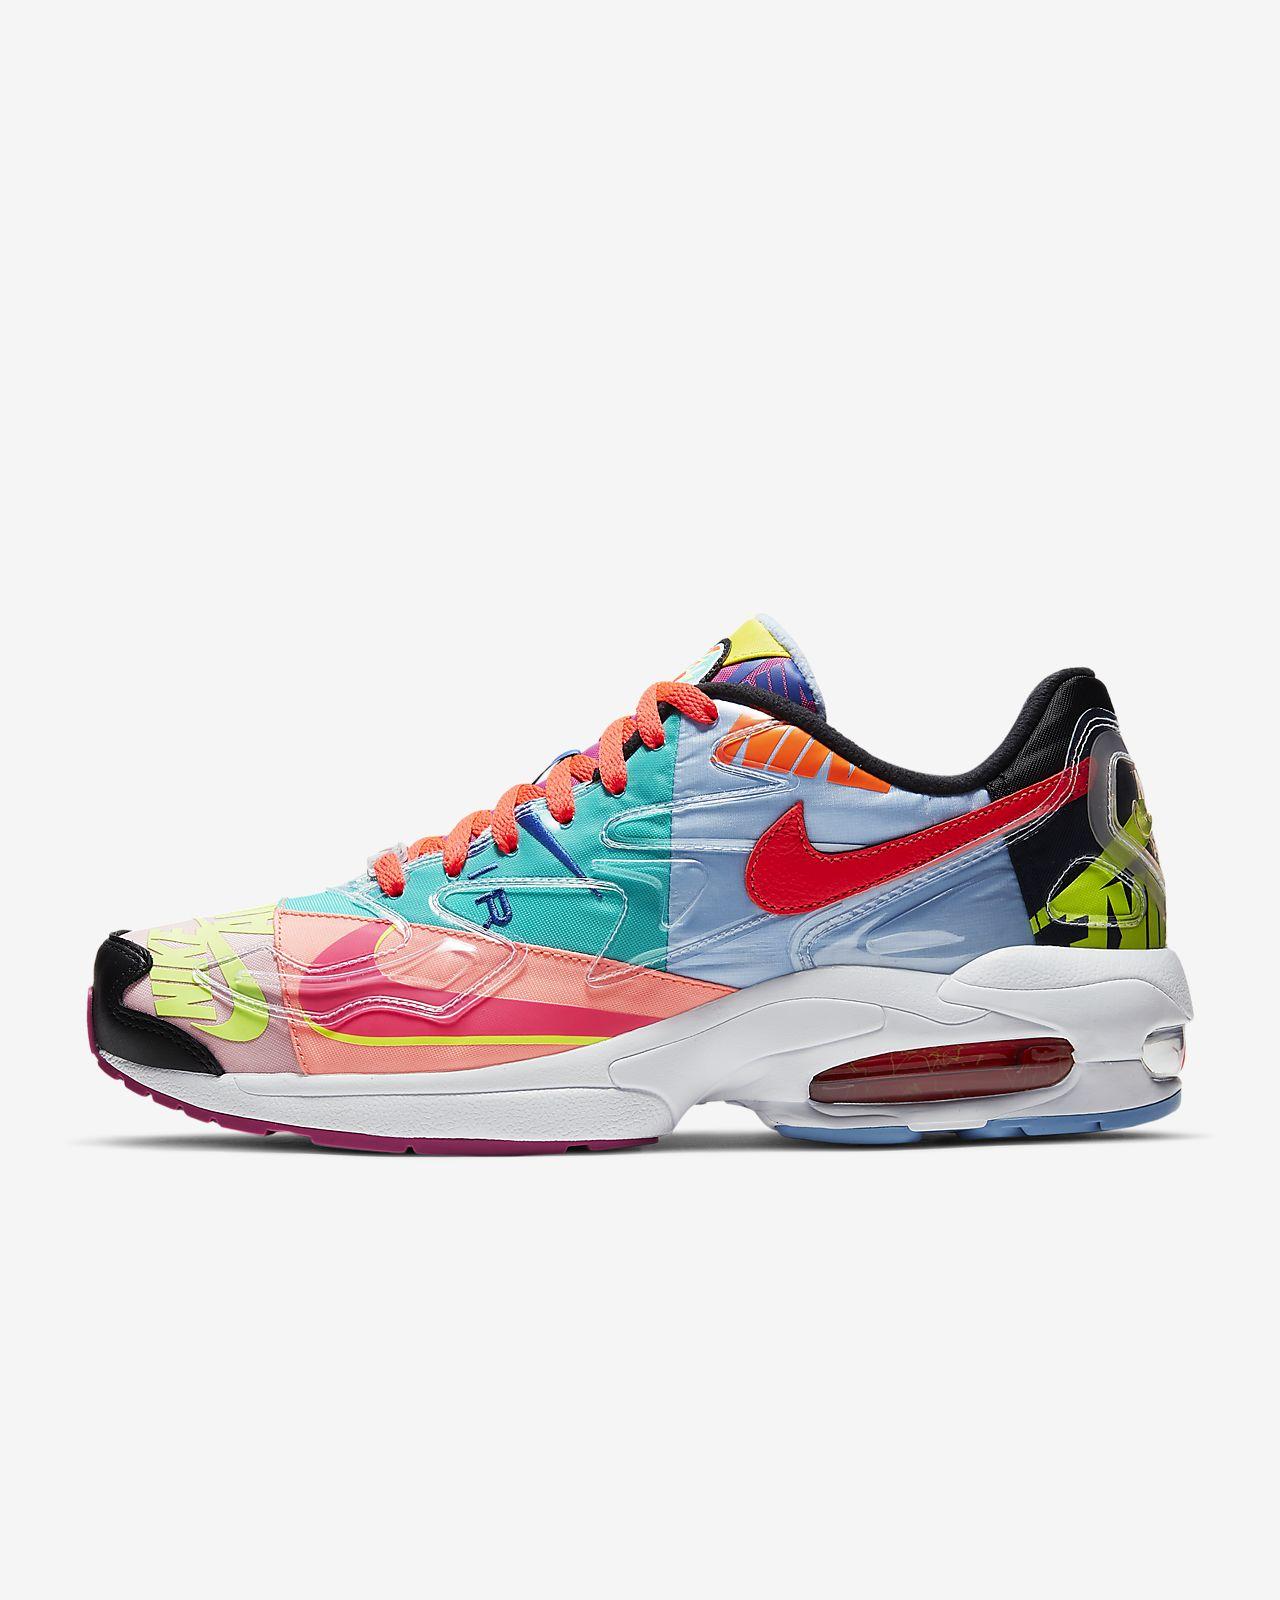 reputable site 30876 bd5d2 ... รองเท้าผู้ชาย Nike Air Max2 Light QS